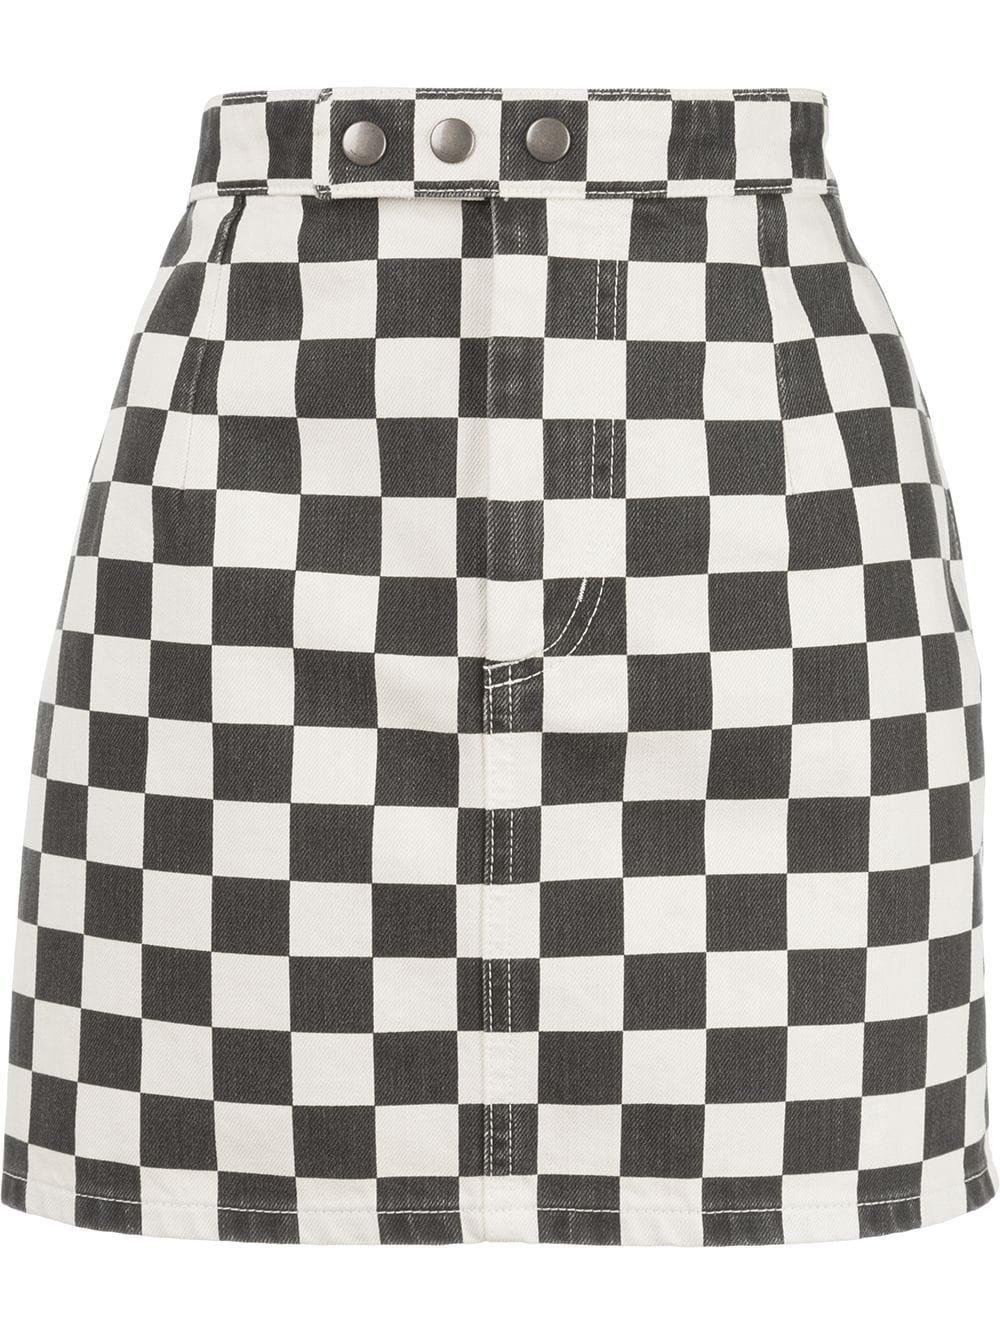 Saint Laurent Checkerboard Mini Skirt | Farfetch.com